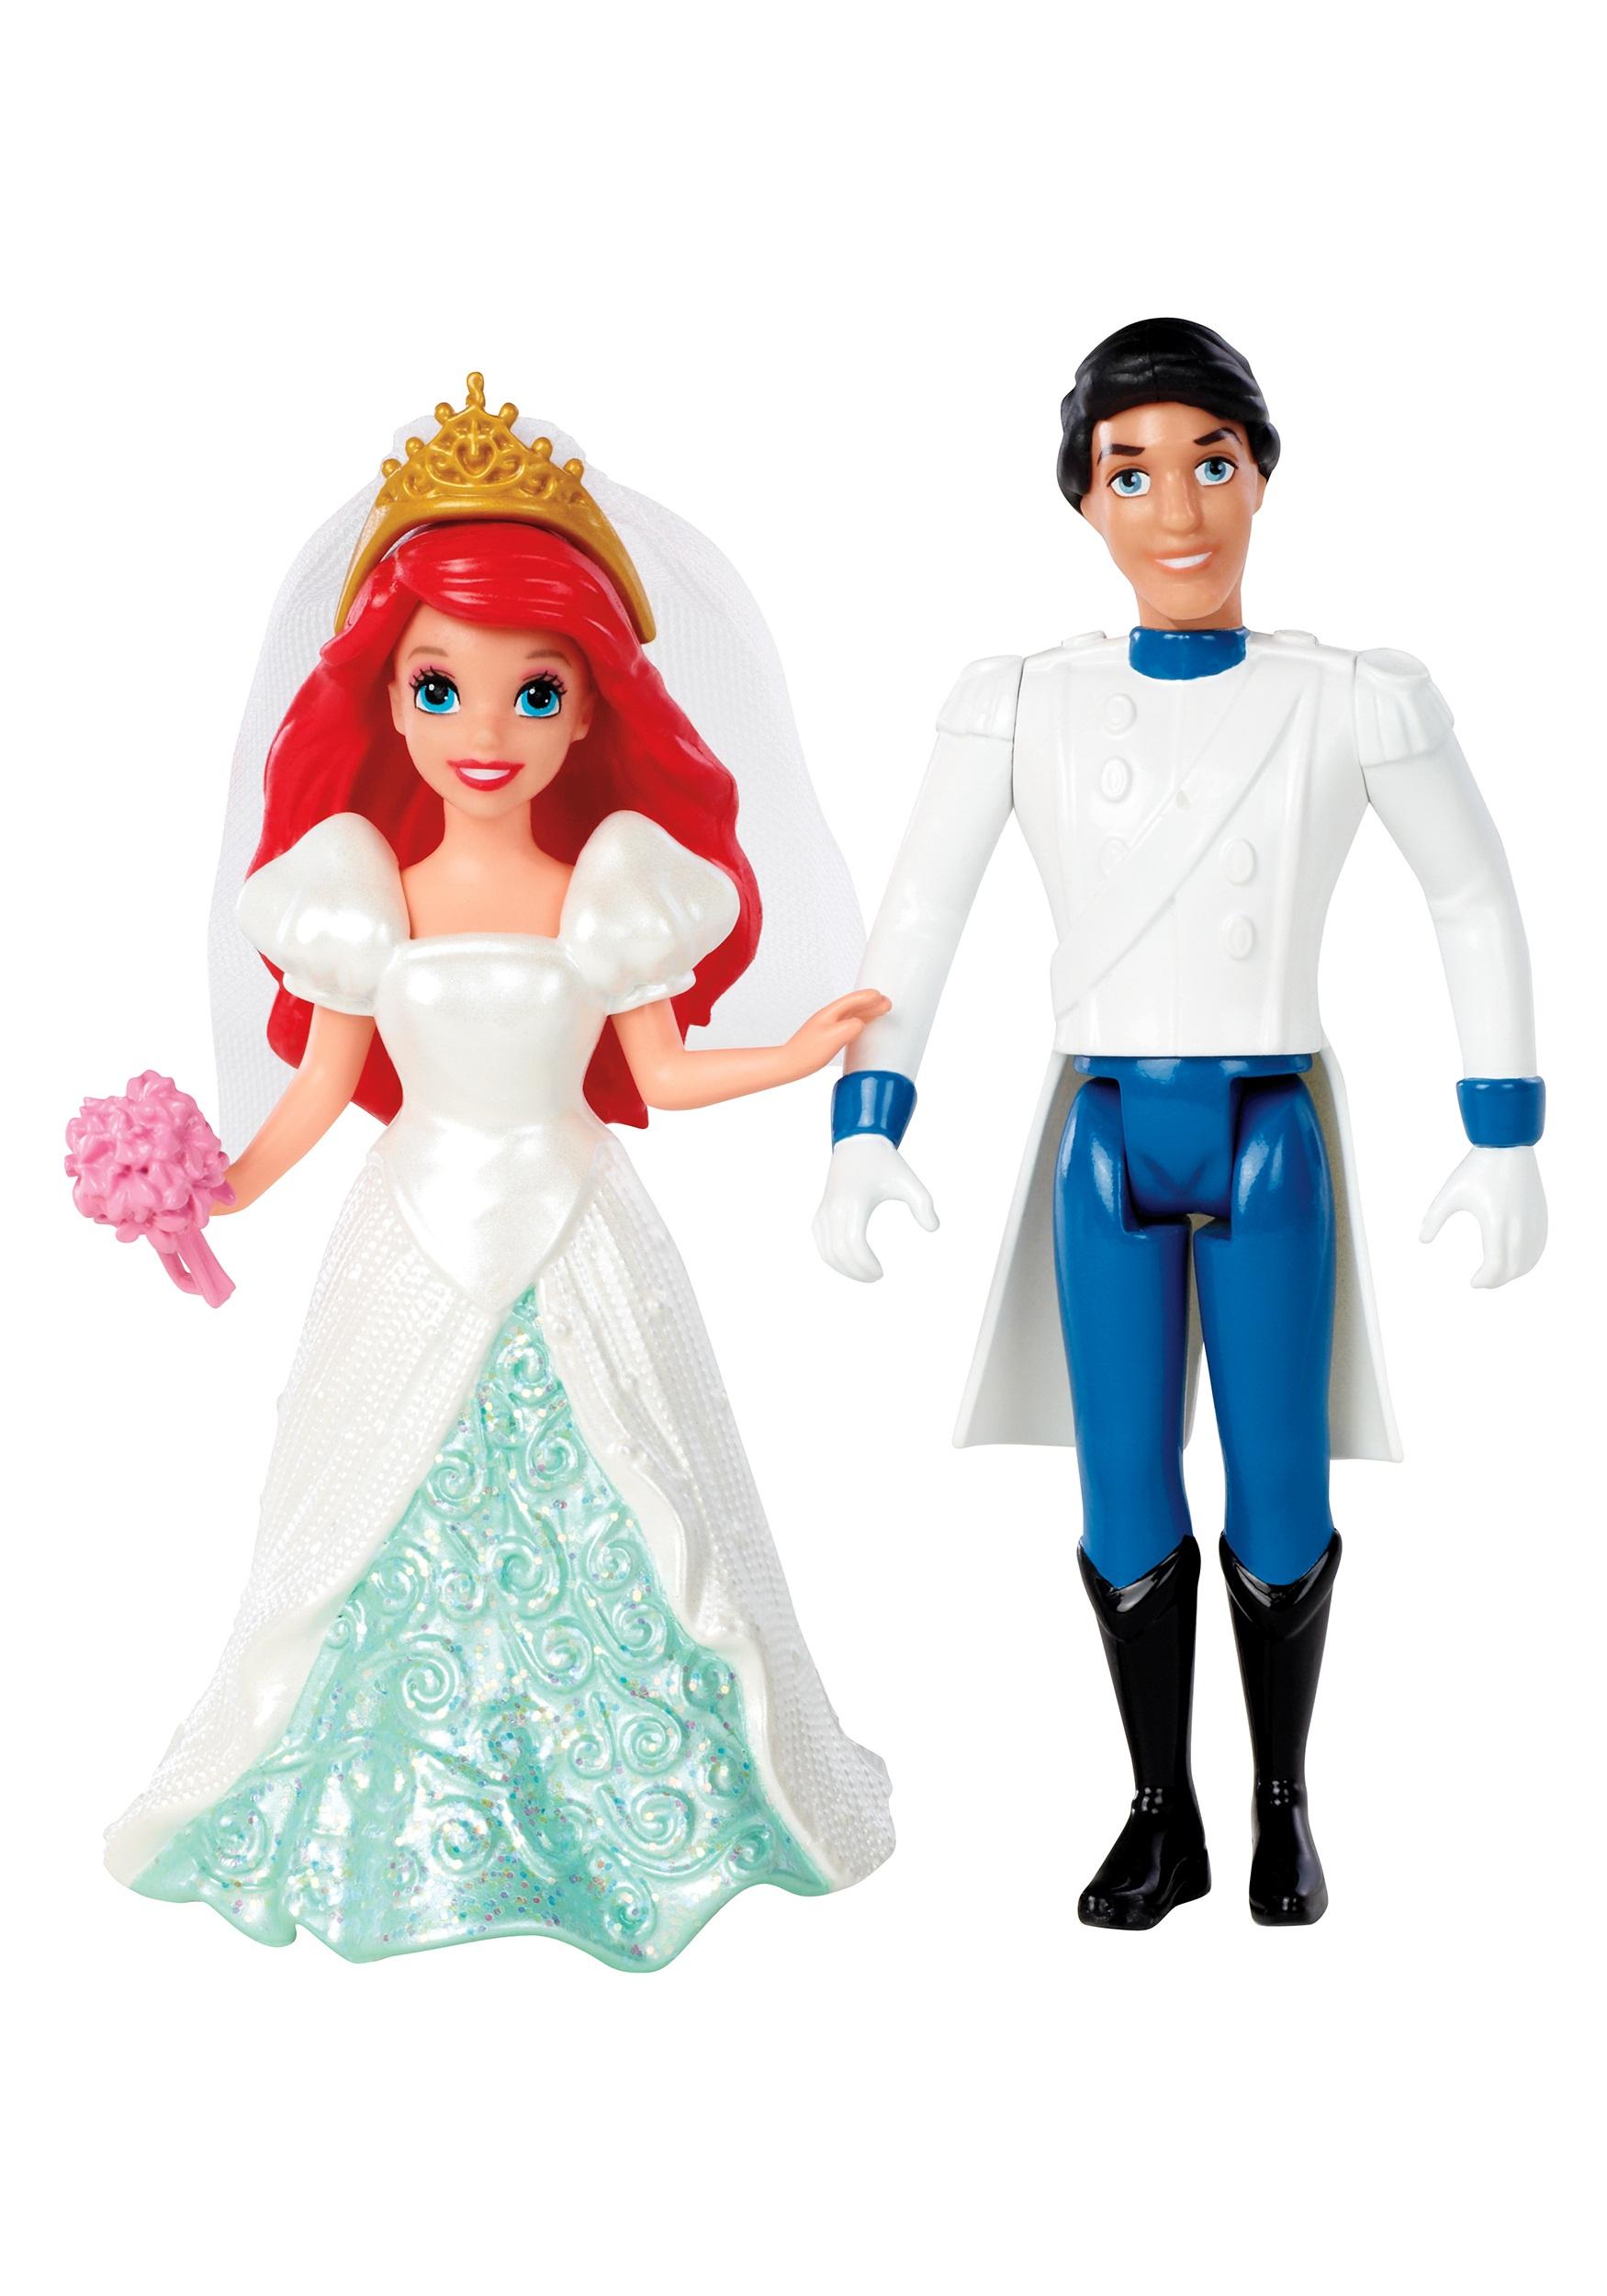 Fairytale Wedding Ariel Prince Eric Magiclip Dolls